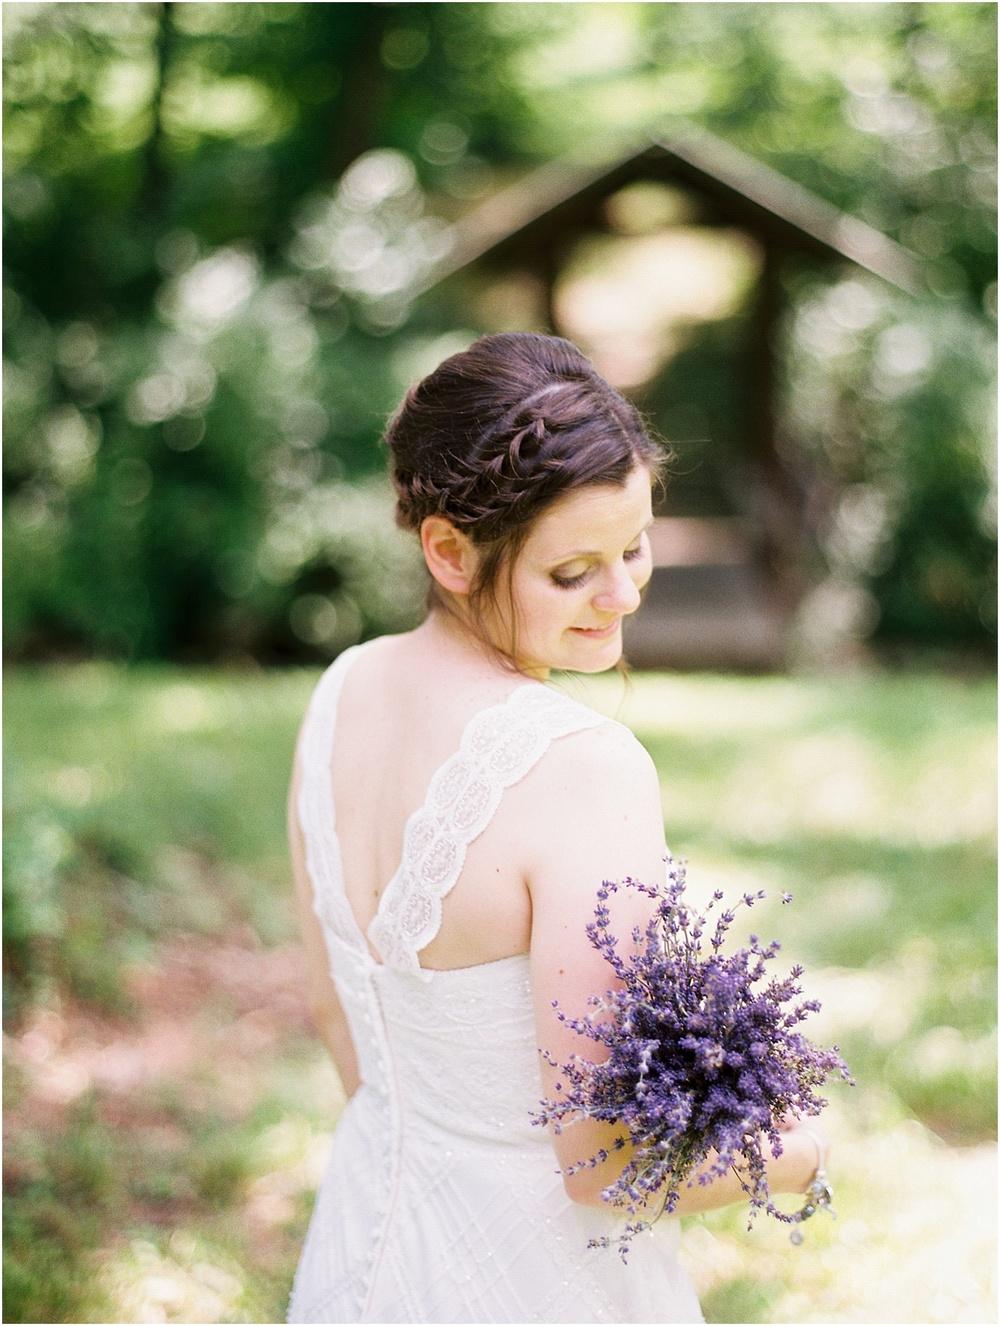 St Louis Wedding Photographer - Jordan Brittley Fine Art Wedding Photography